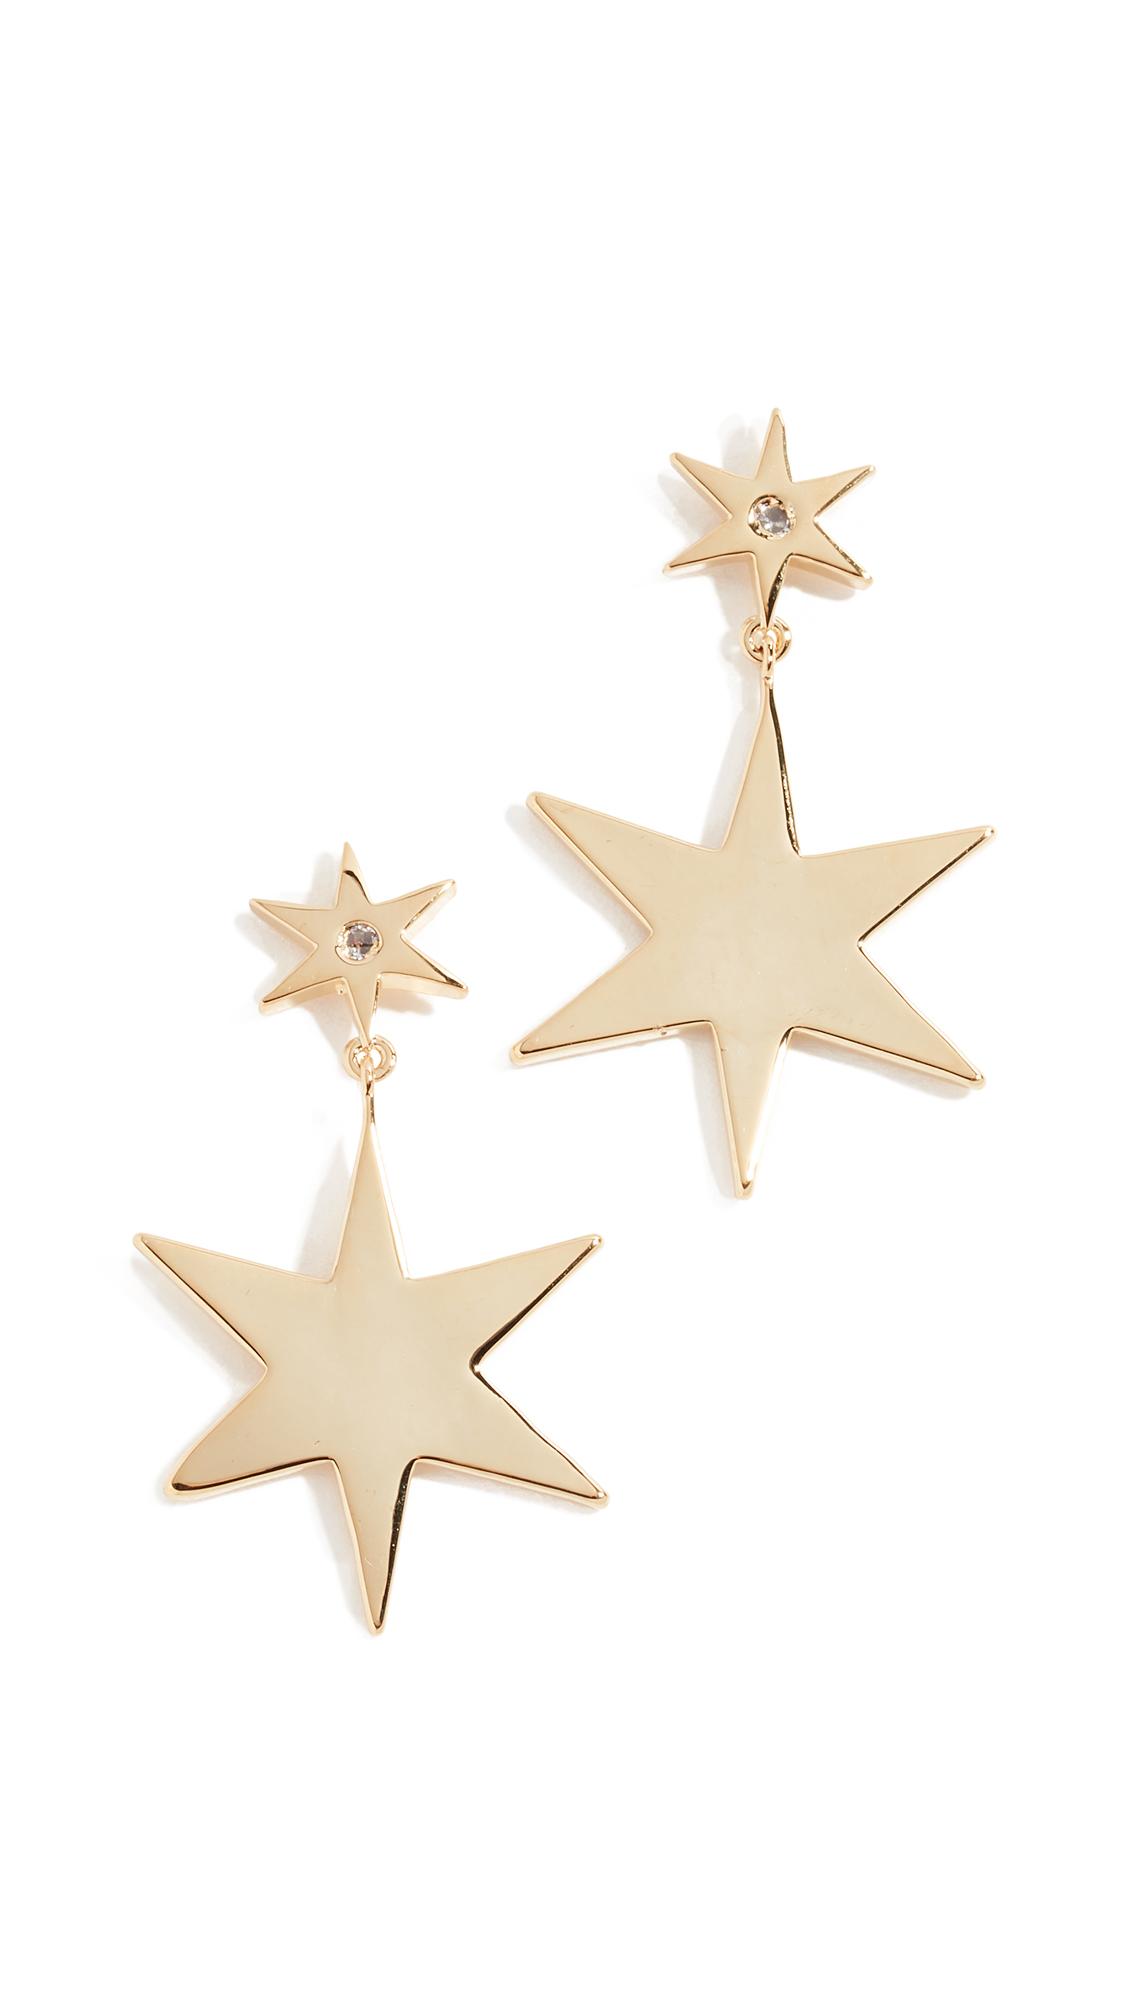 JULES SMITH STAR BRIGHT EARRINGS